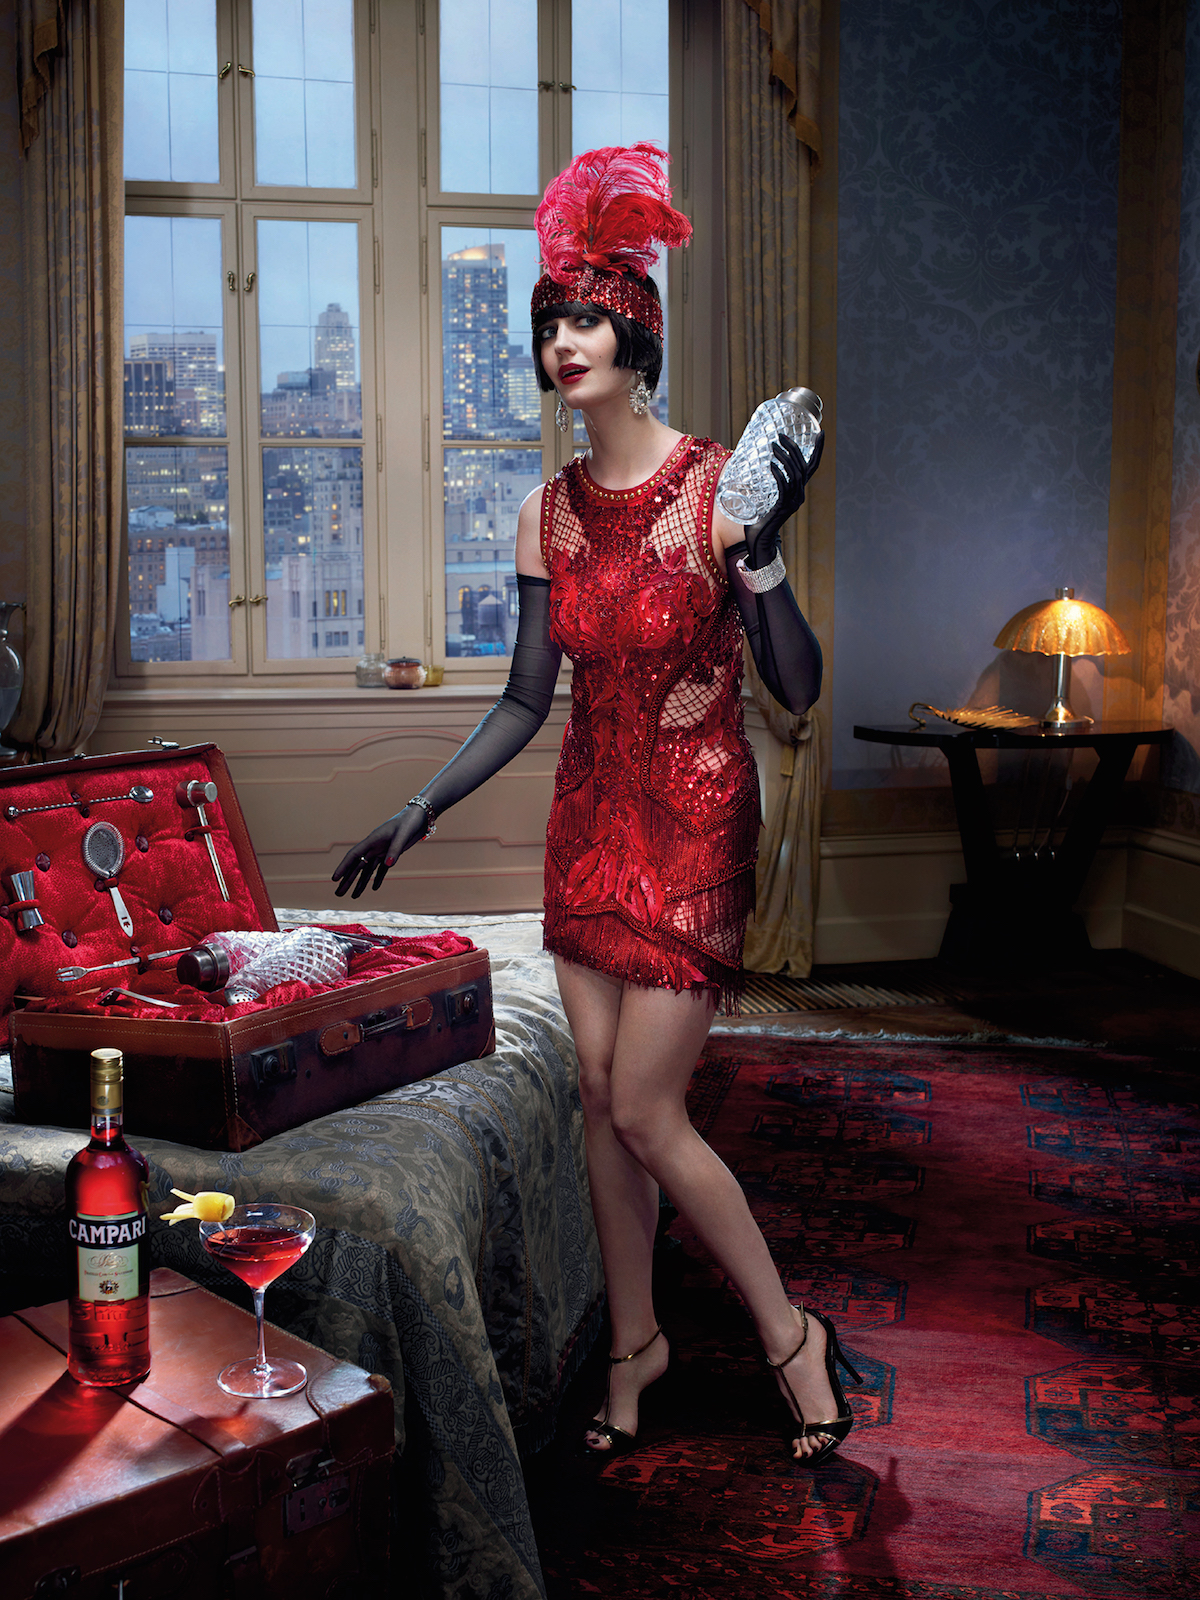 Eva Green in calendarul Campari 2015. Mythology Mixology.